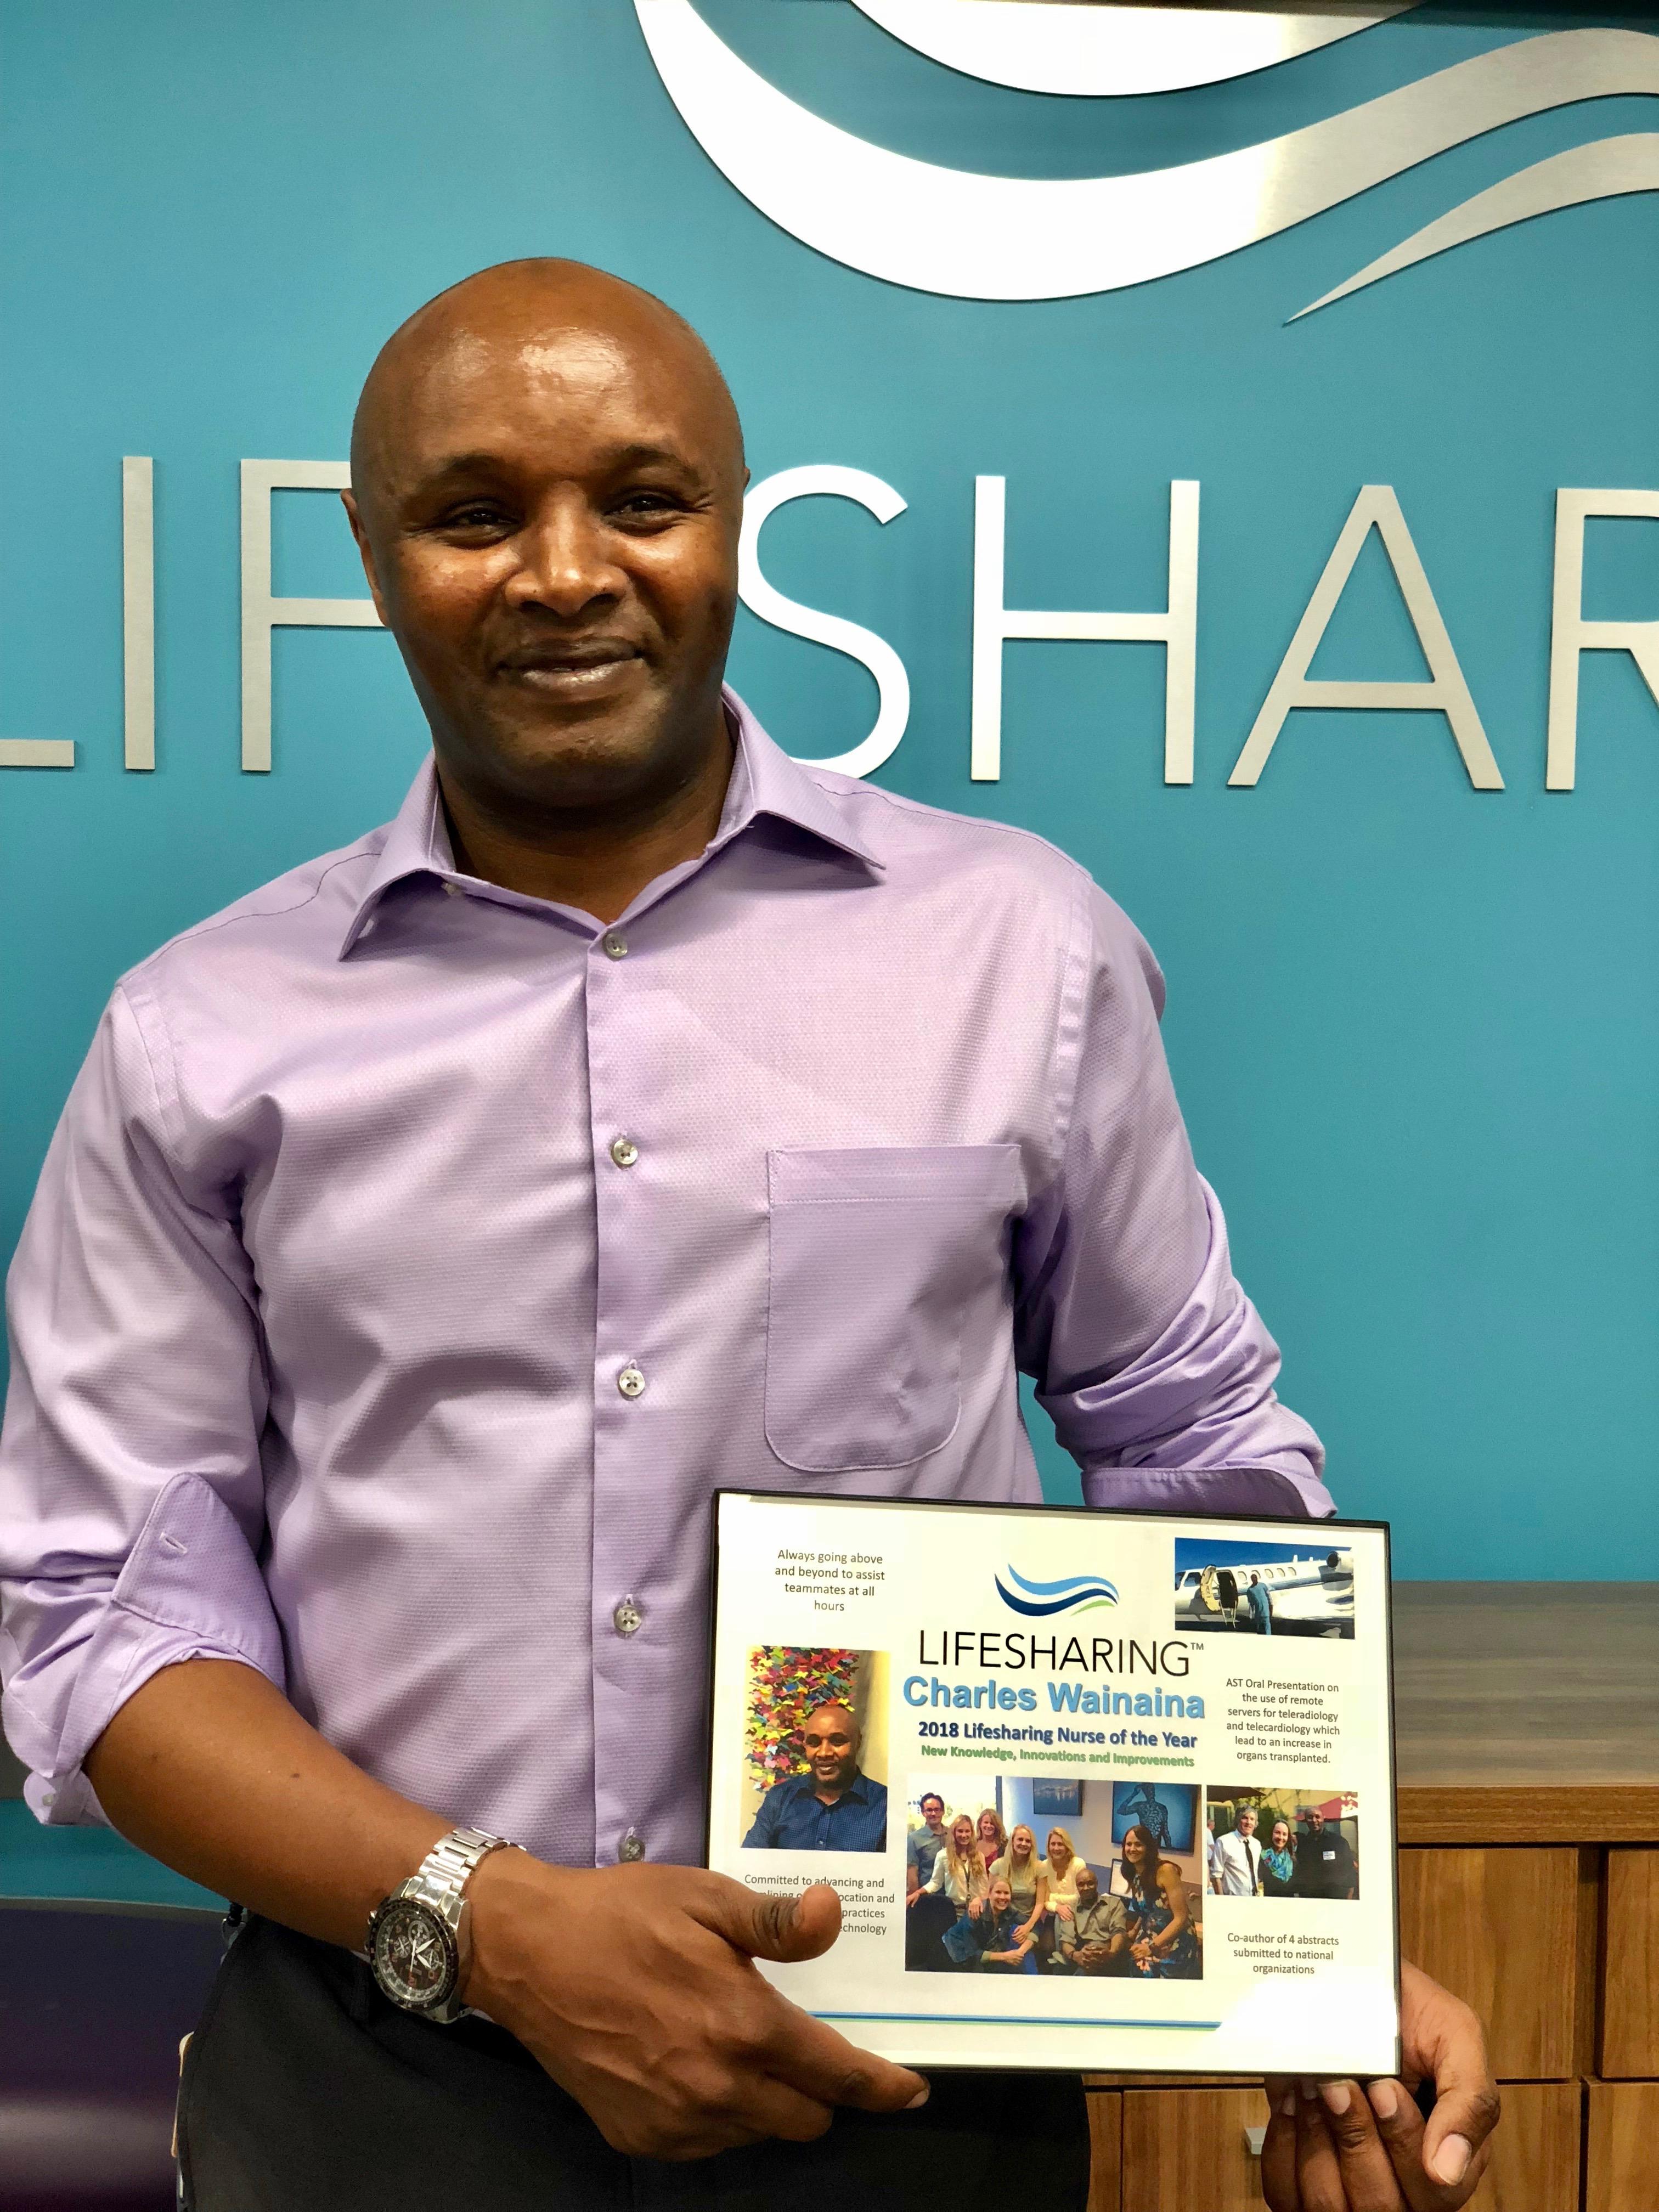 Charles Wainaina, Lifesharing Nurse of the Year